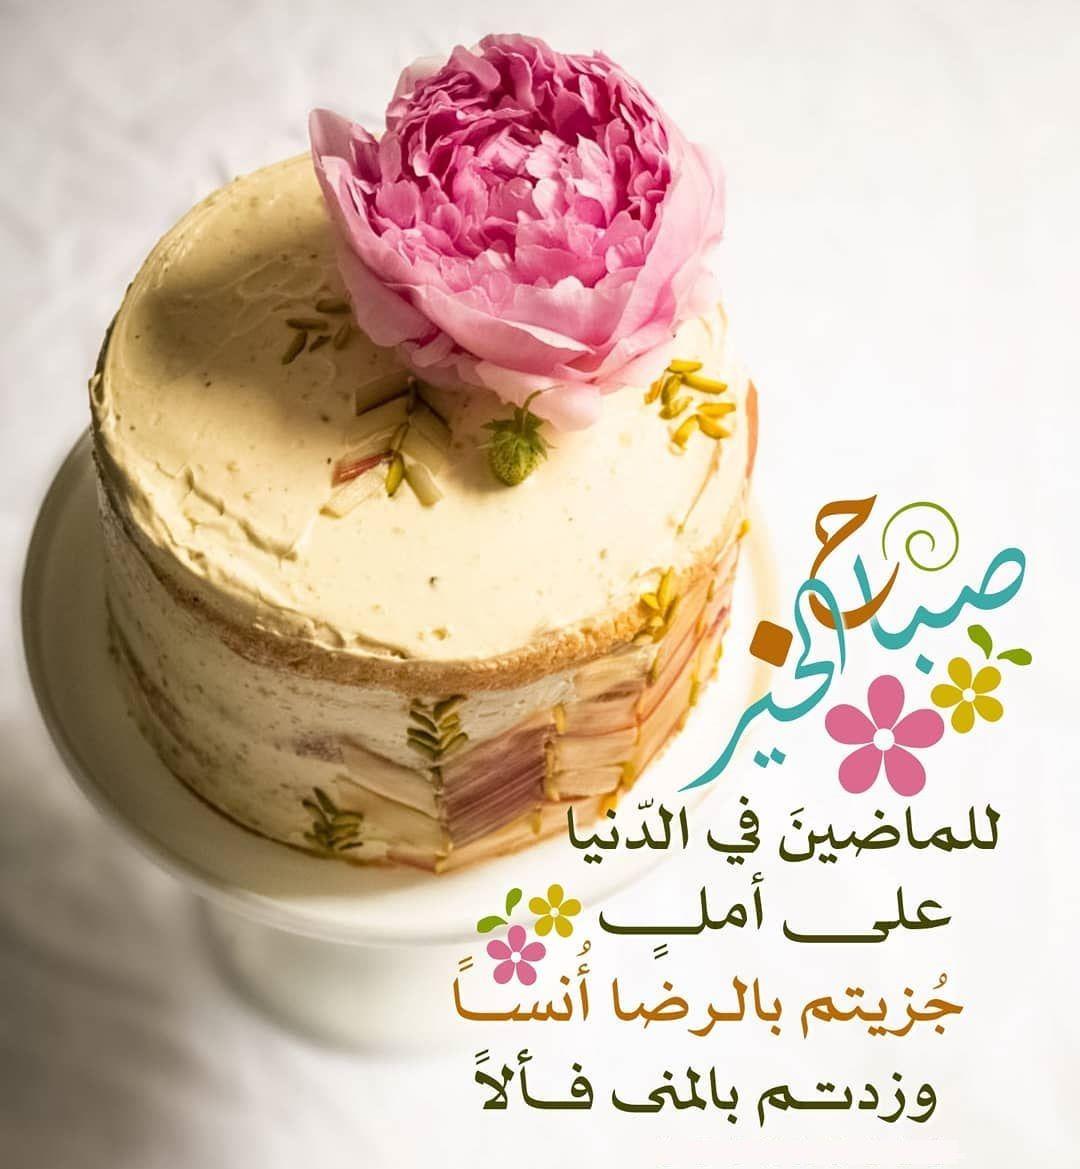 Pin By رغــــــد On بطـاقـات صبـاحيـة واسـلاميـة 2 Mini Cheesecake Cheesecake Cake